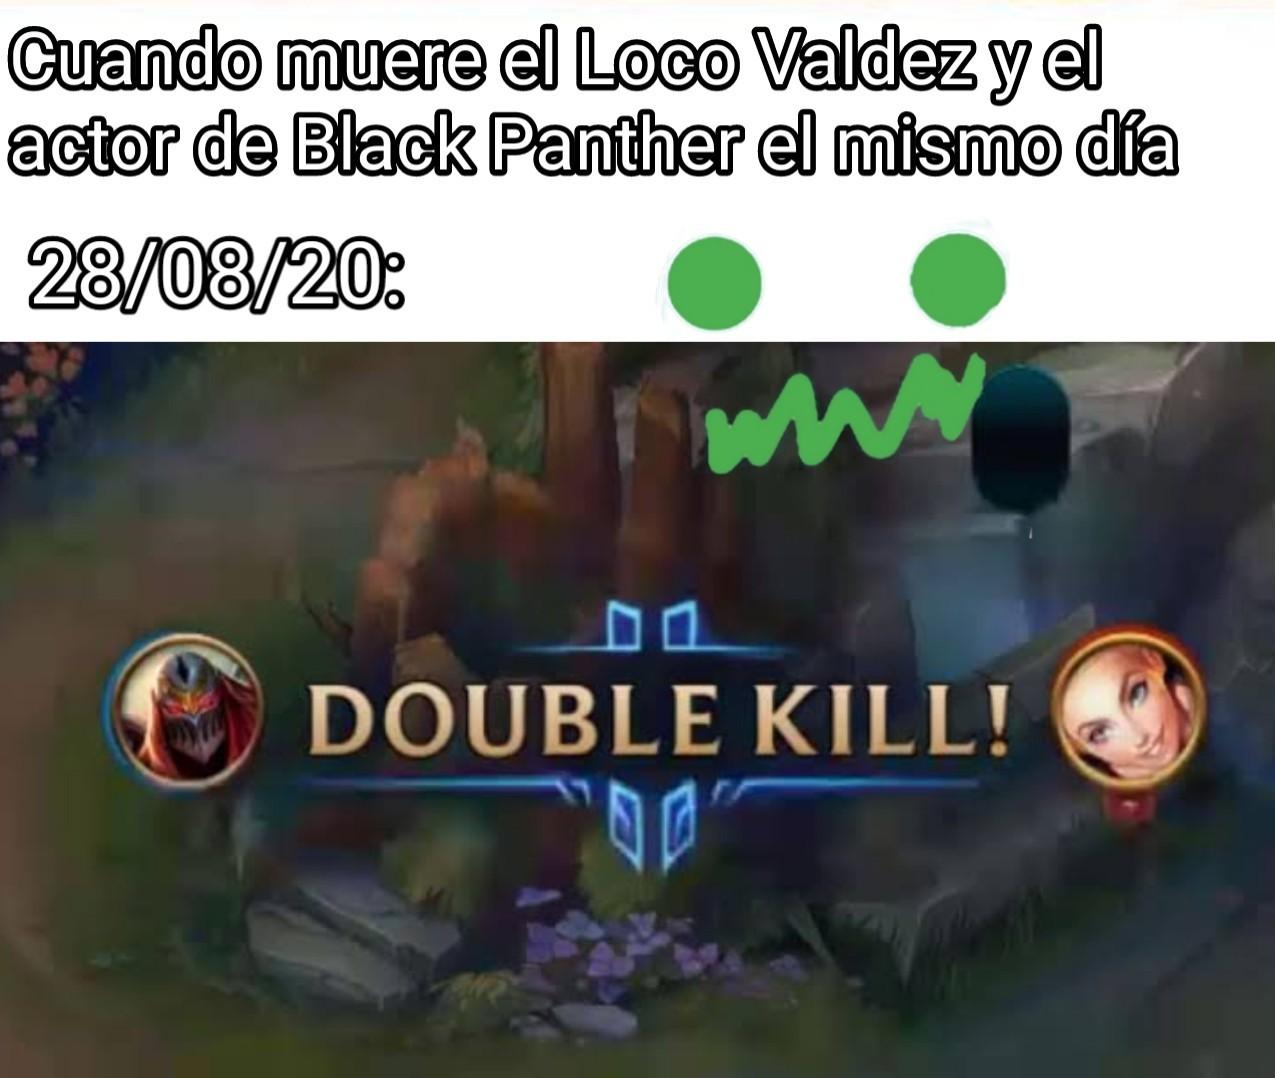 Matanza doble - meme